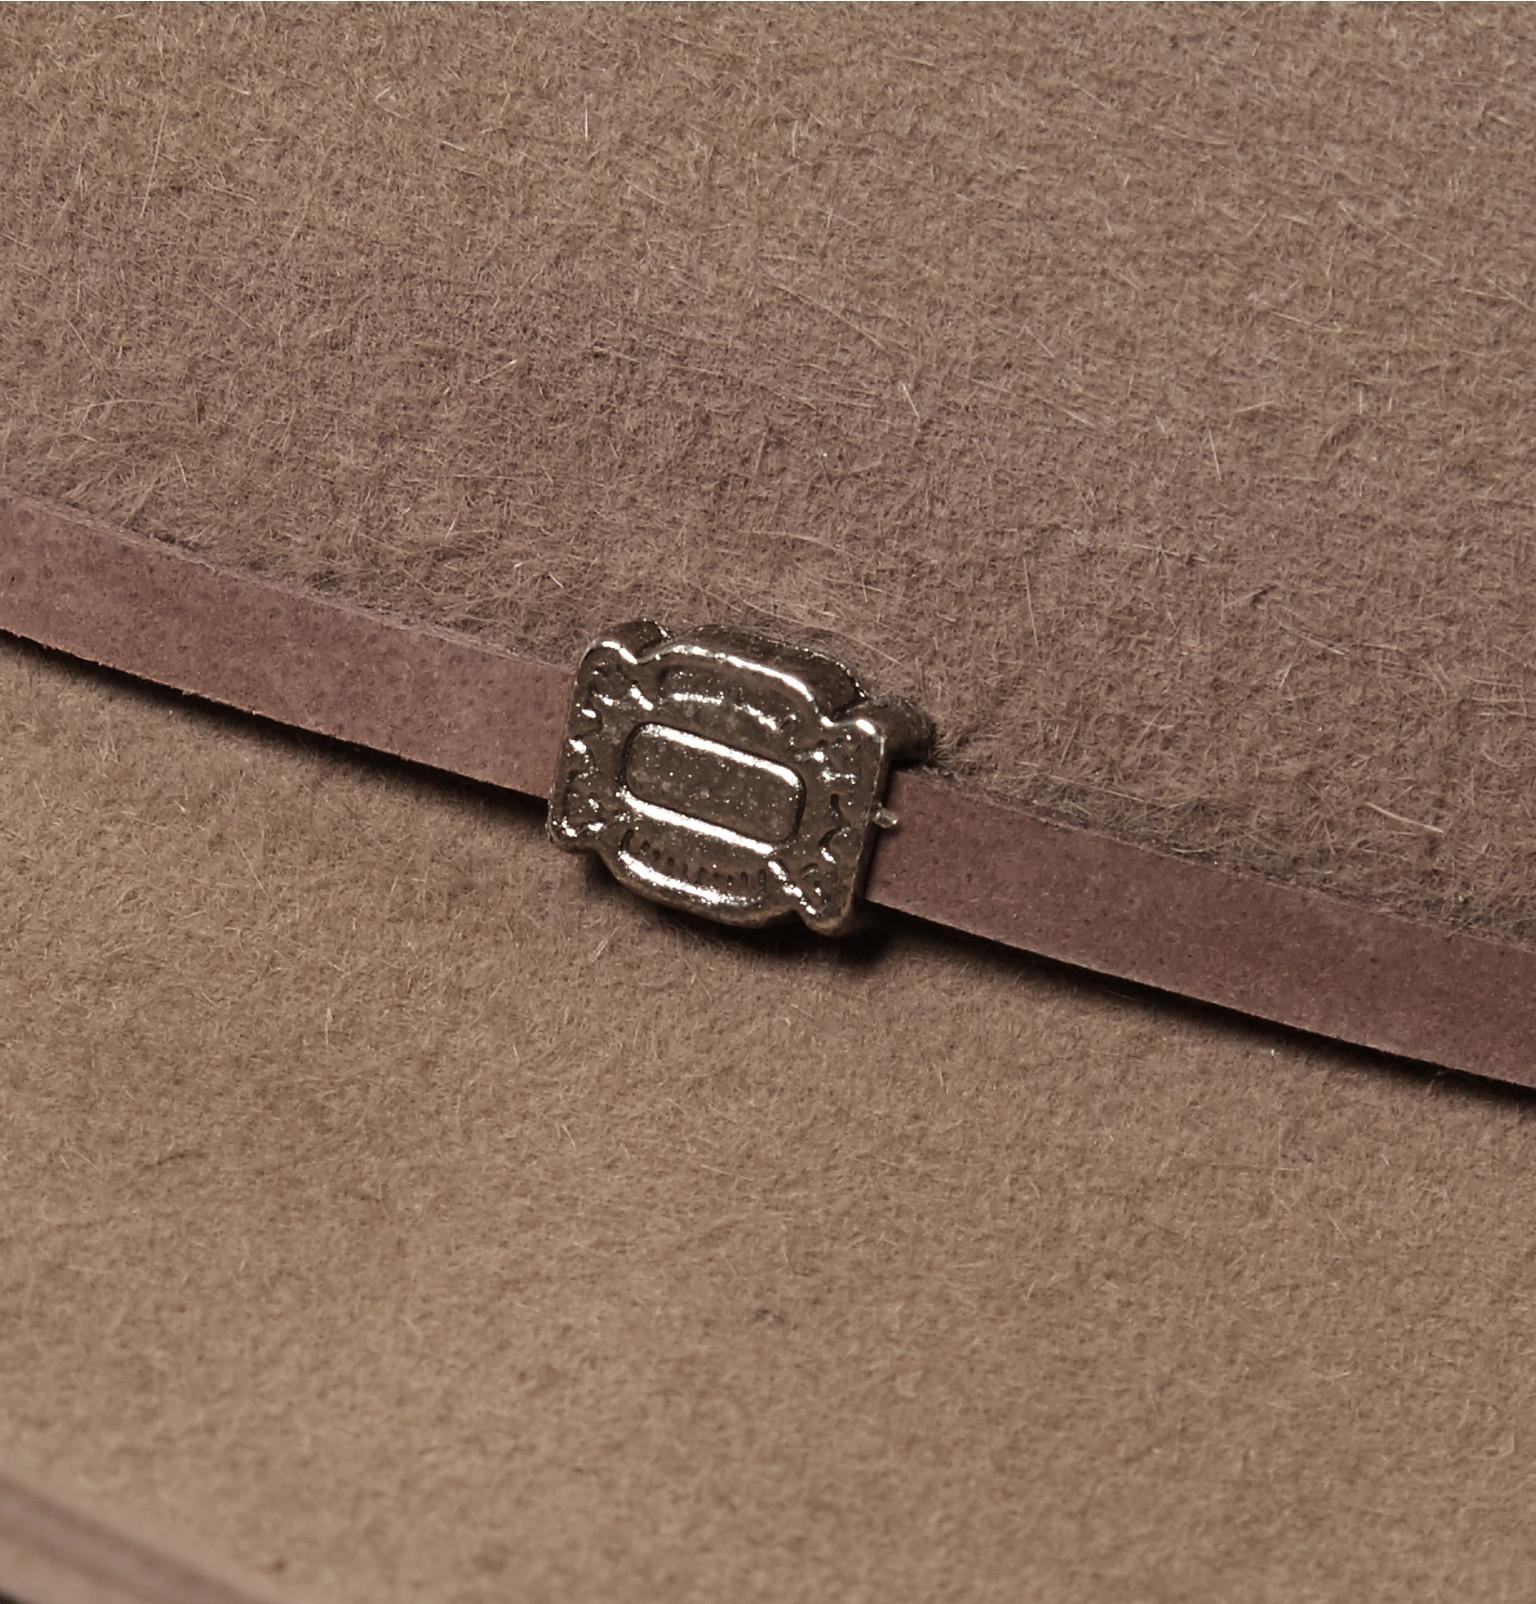 Lyst - Kingsman Stetson Tequila s Statesman Leather-trimmed Felt Hat ... ff9d8997524